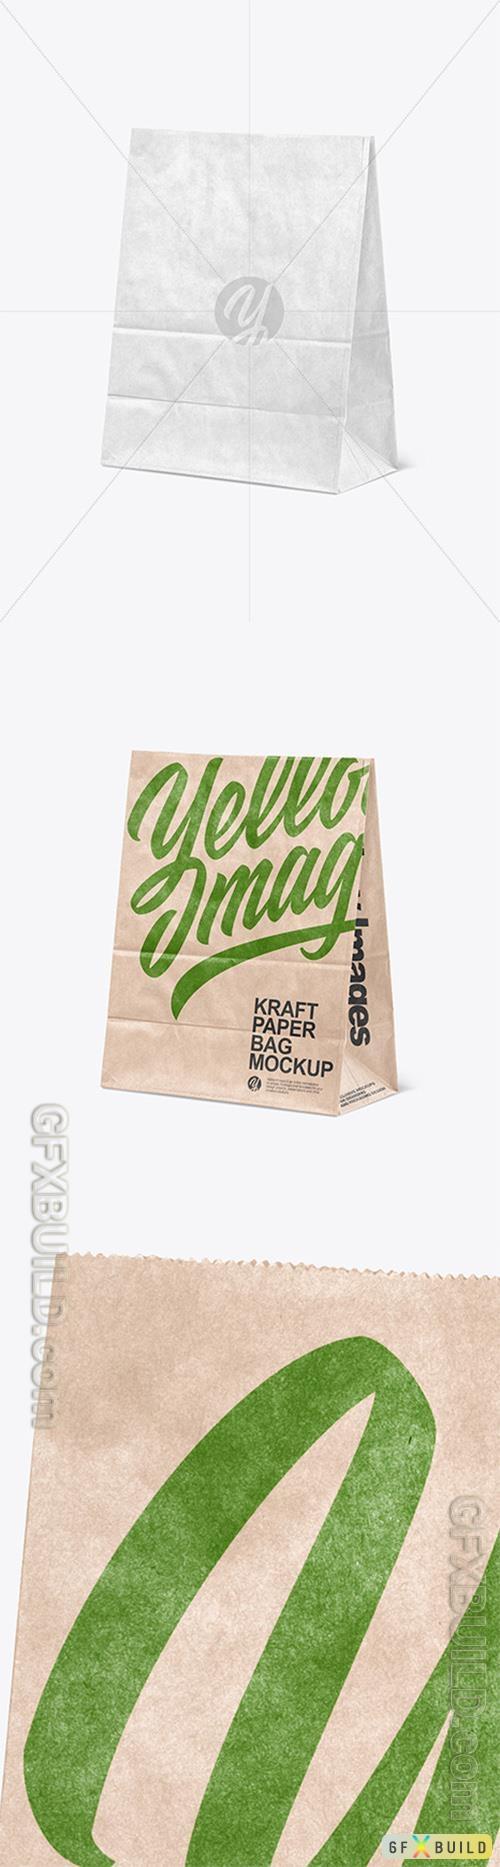 Kraft Paper Shopping Bag Mockup 89364